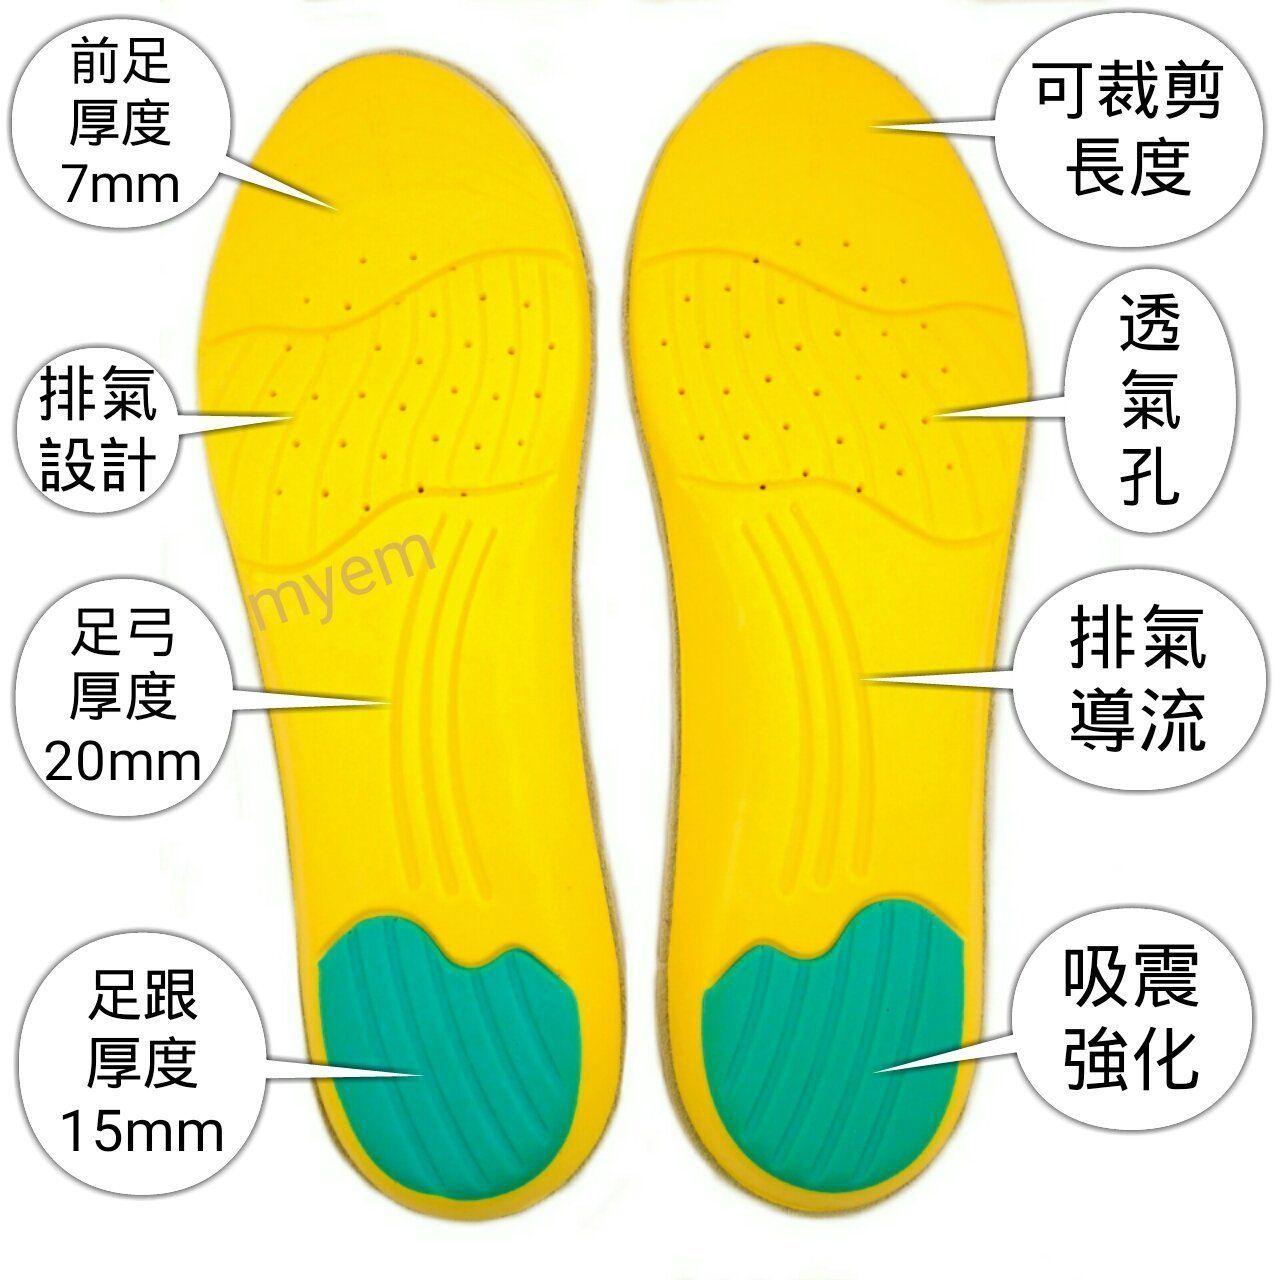 15mm PU柔軟彈力氣墊鞋墊 牛皮 舊LANEW鞋墊替換 Timberland Red Wing 鞋墊換新 運動鞋墊-Yahoo奇摩拍賣